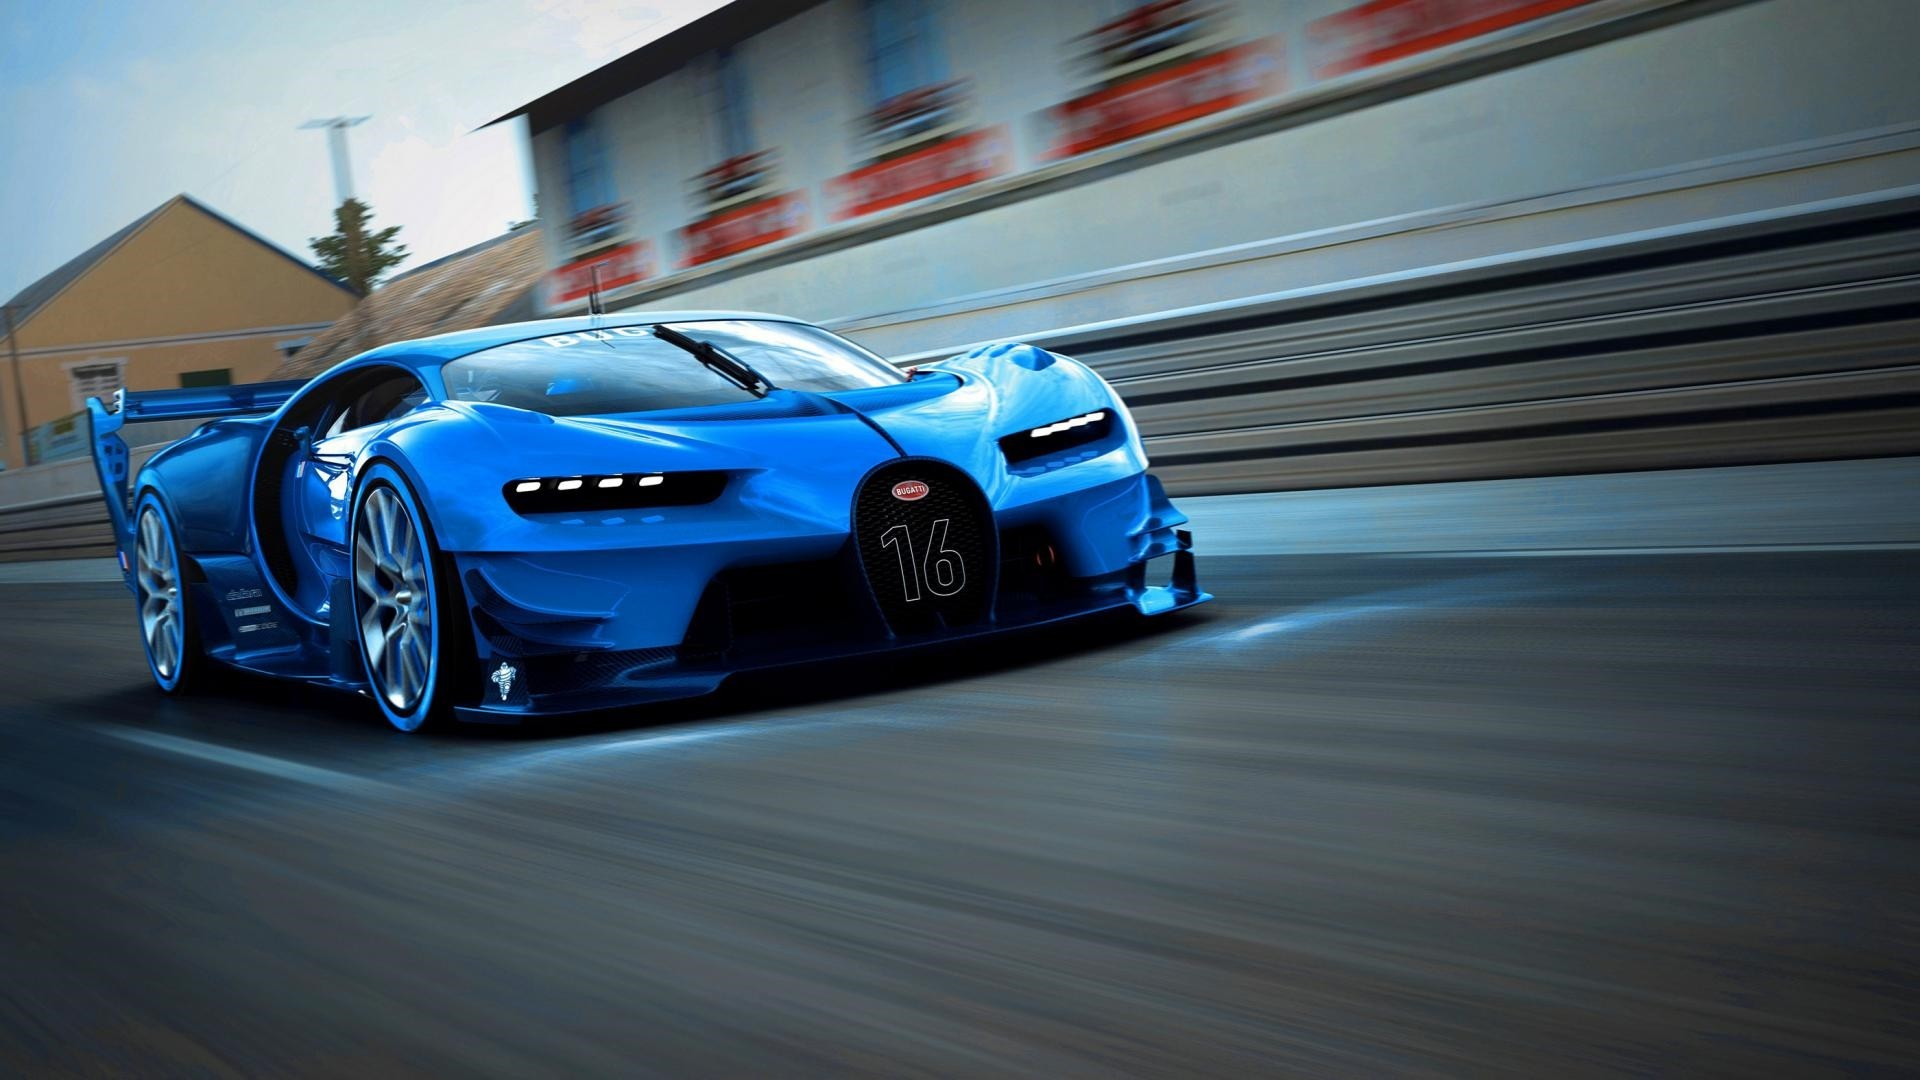 Bugatti Chiron Full HD Wallpaper